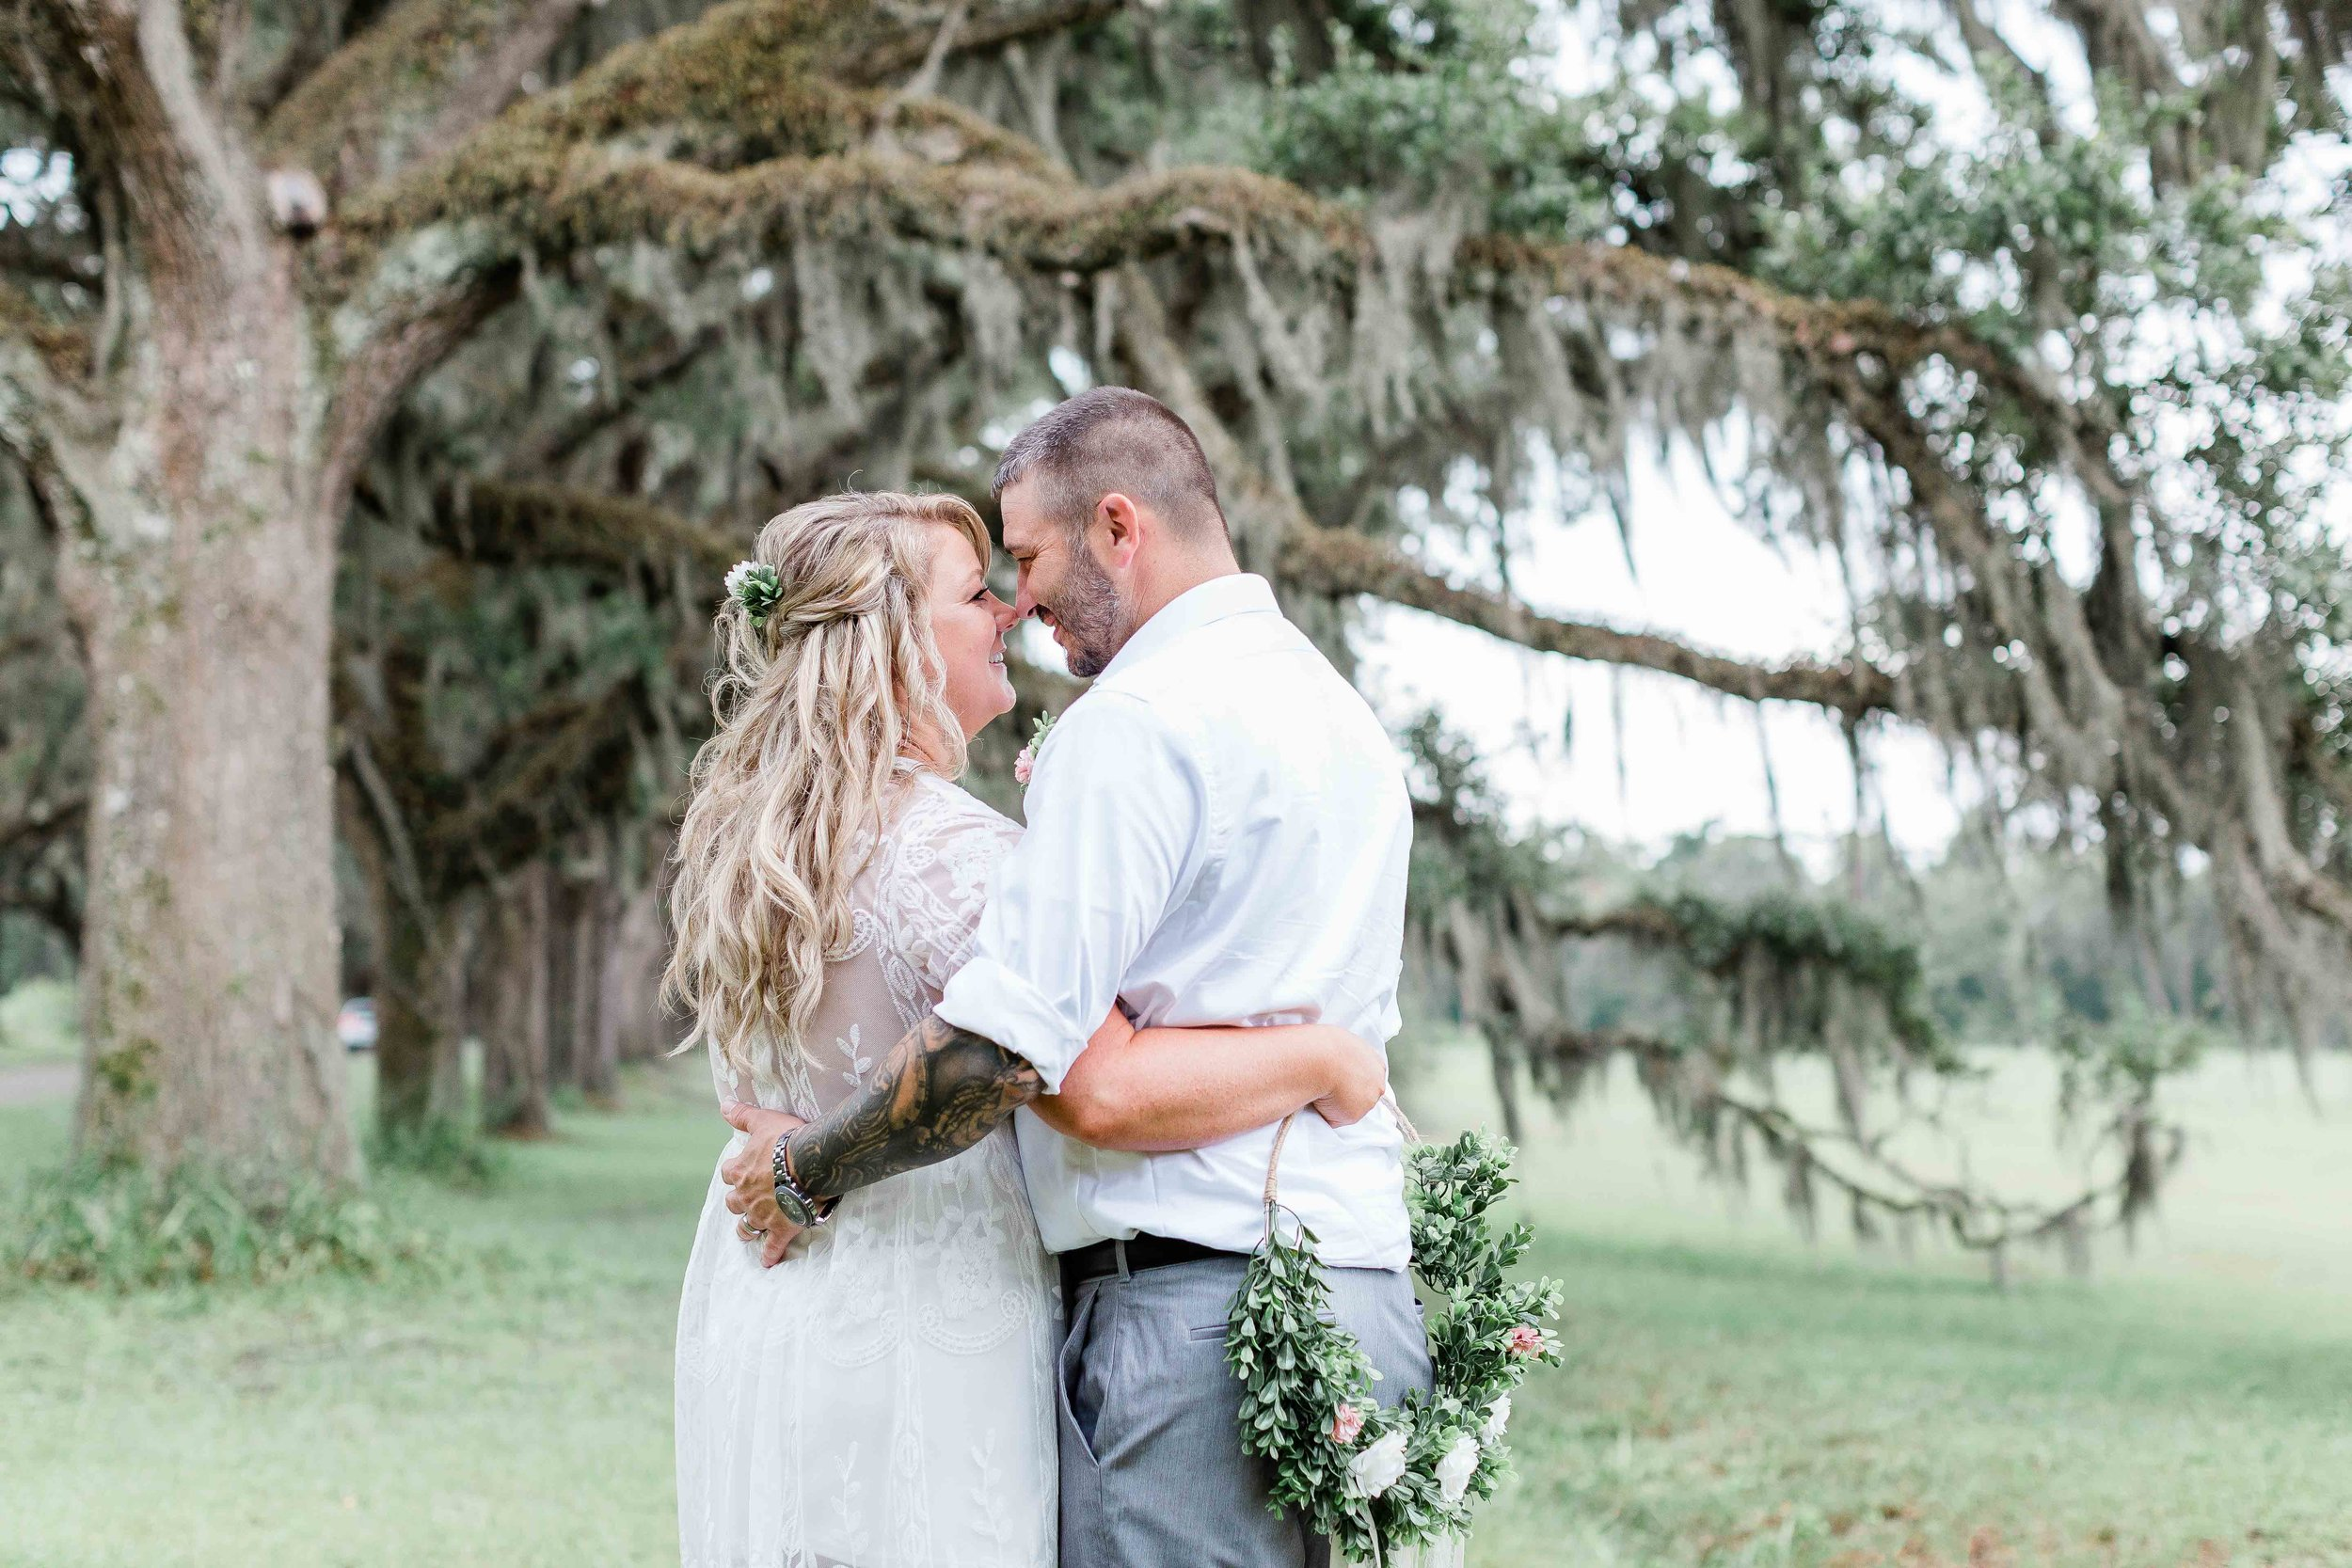 20190727Georgia-Wormlsoe Plantation-Simply Eloped-Savannah Wedding Photographer- Southern Lens Photography12.jpg